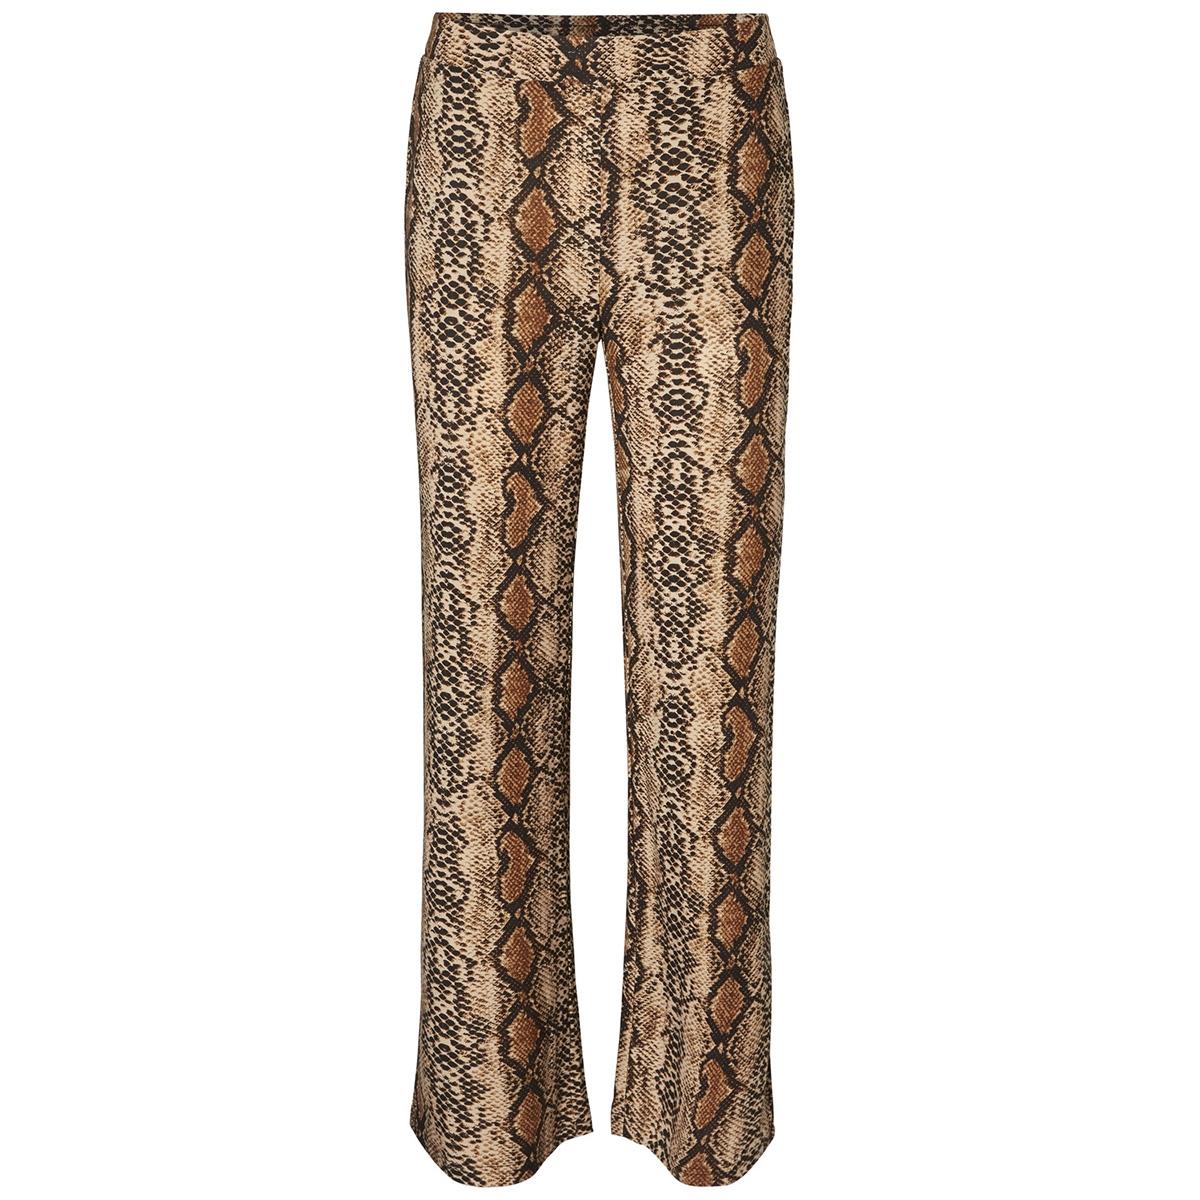 nmsally snake nw loose pant x4 27008005 noisy may broek black/brown color